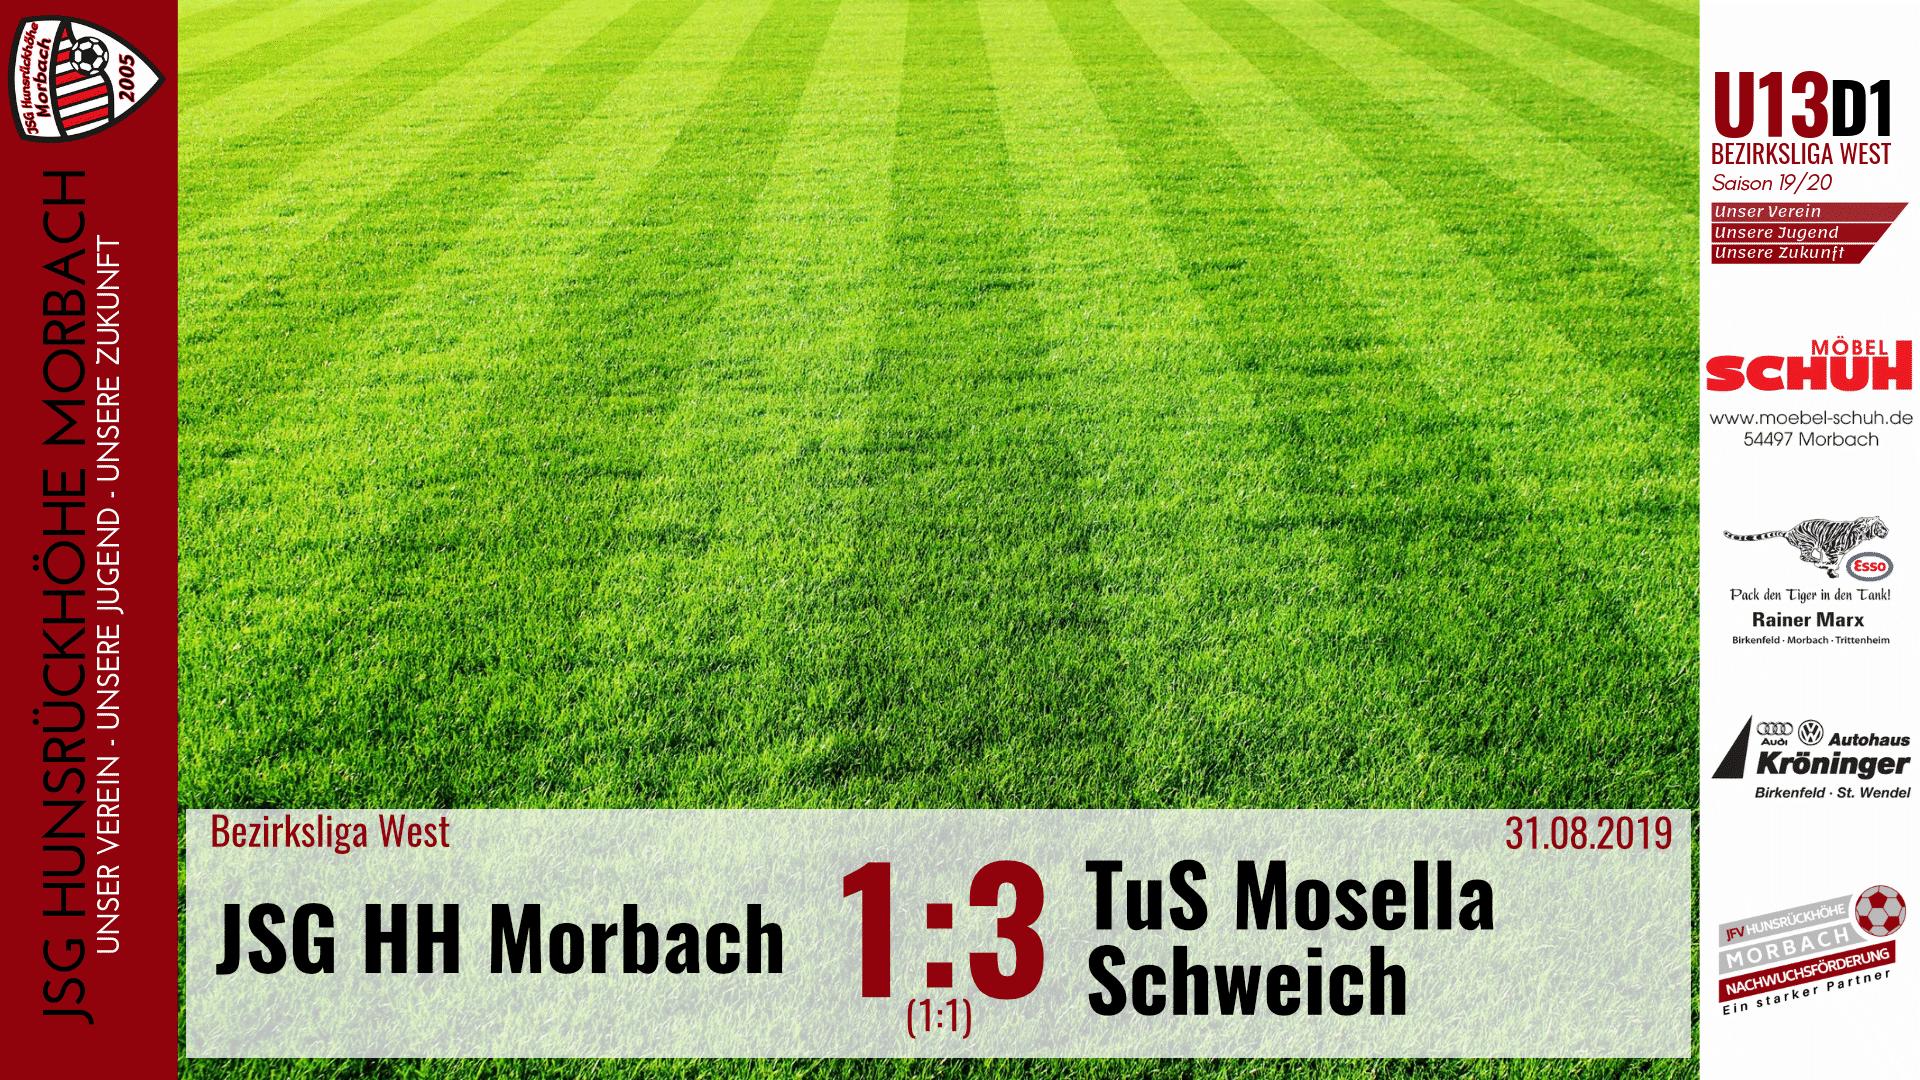 U13 D1: JSG Hunsrückhöhe Morbach – TuS Mosella Schweich I 1:3 (1:1)